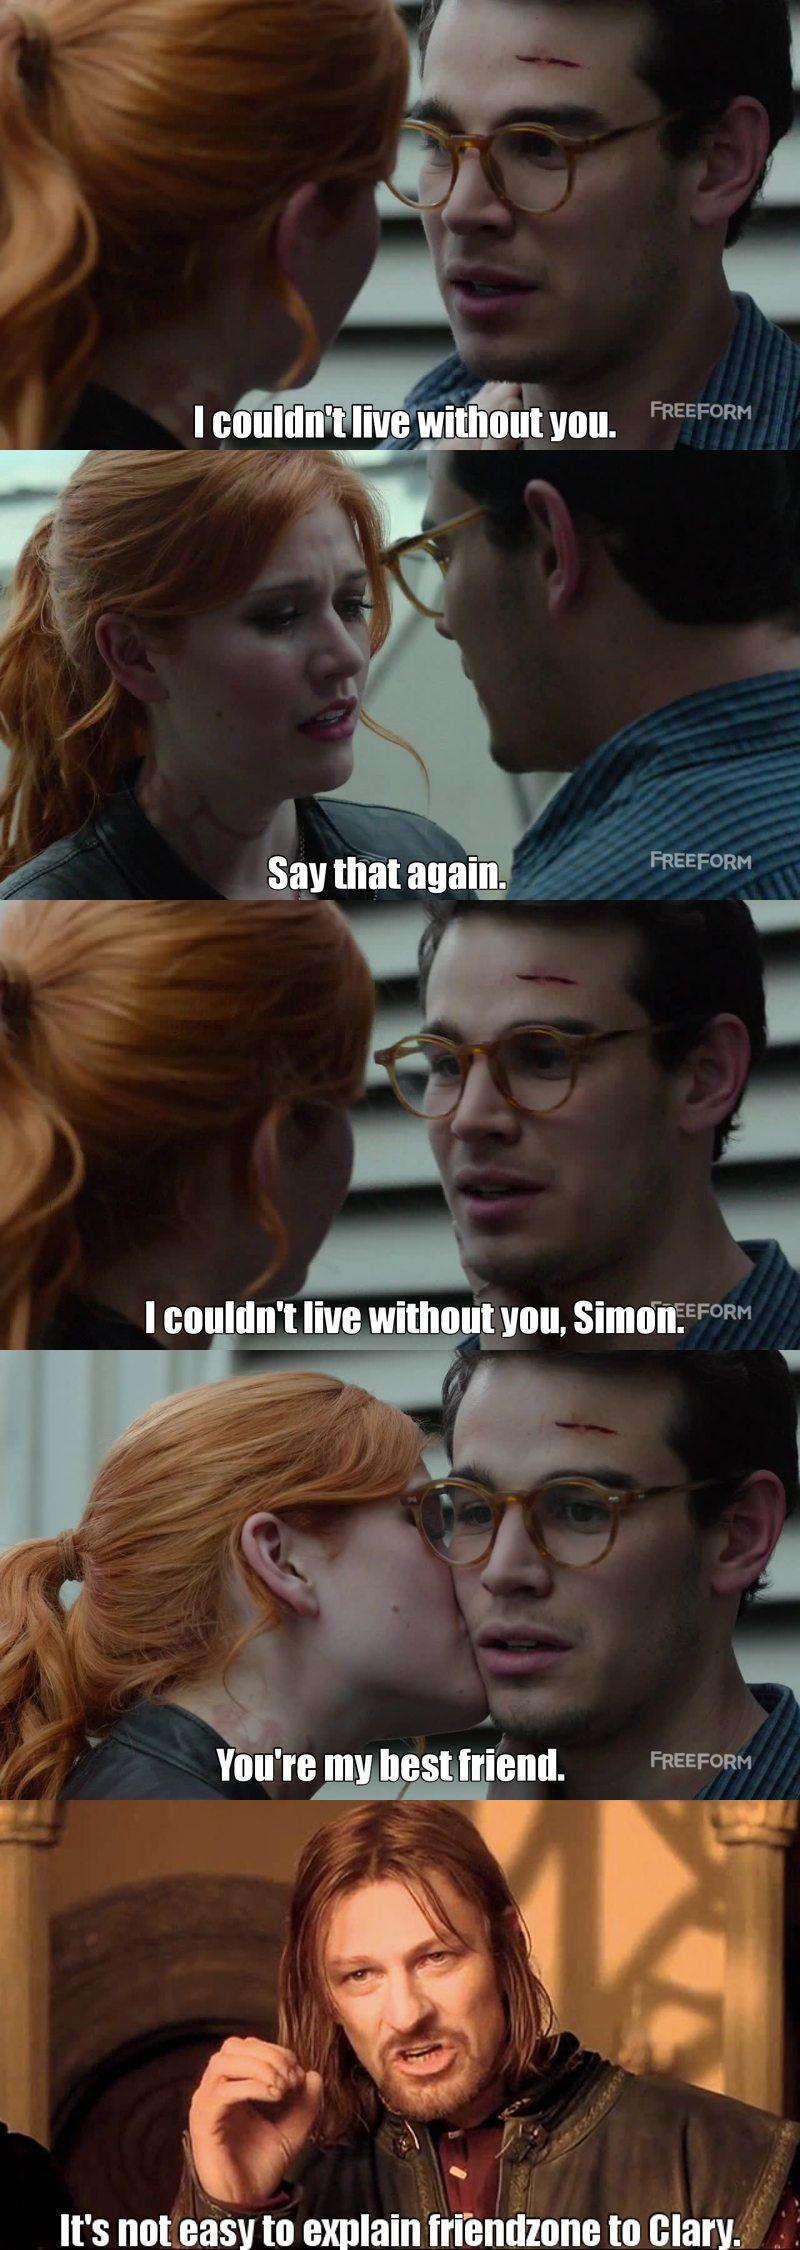 Poor Simon. 😂😂😂 my little nerd!